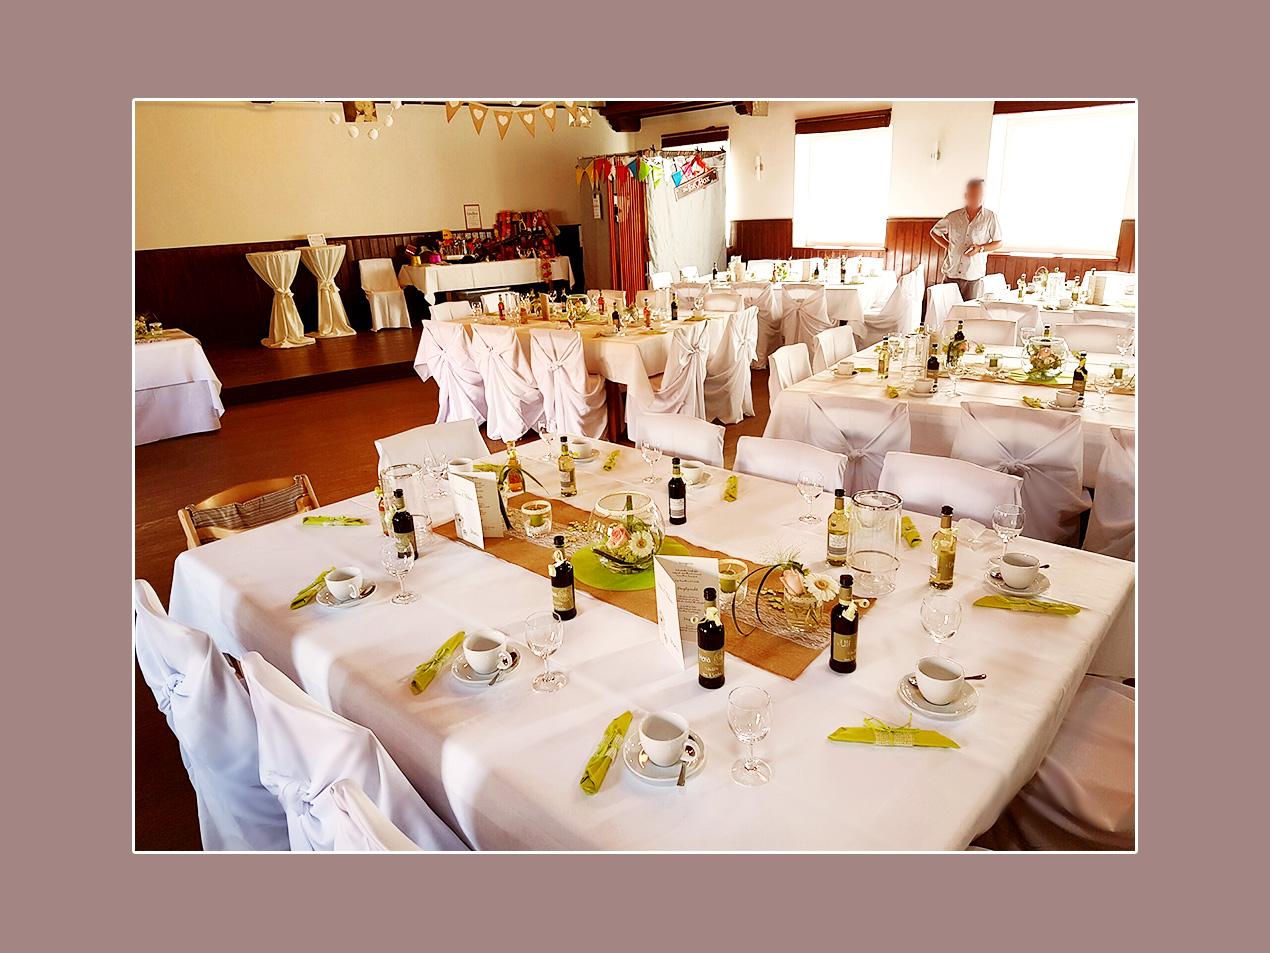 Hochzeitslocation-Gressano-Saal-Ebensfeld-Umgebung-Bamberg-Coburg